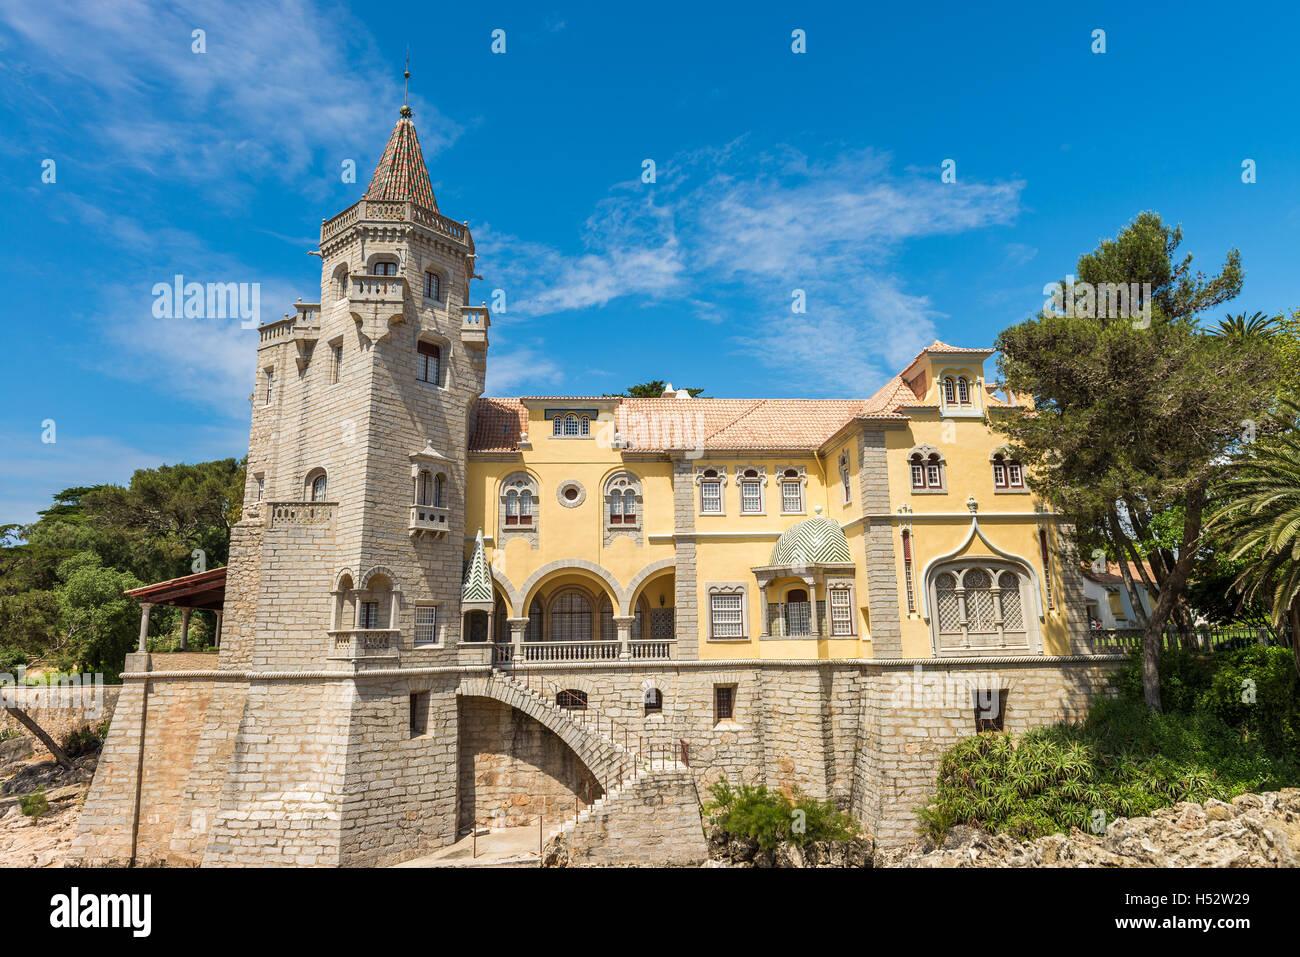 Cascais, Portugal - Abril 22, 2014: hermoso edificio del Museu Condes de Castro Guimarães en Cascais, Portugal Foto de stock